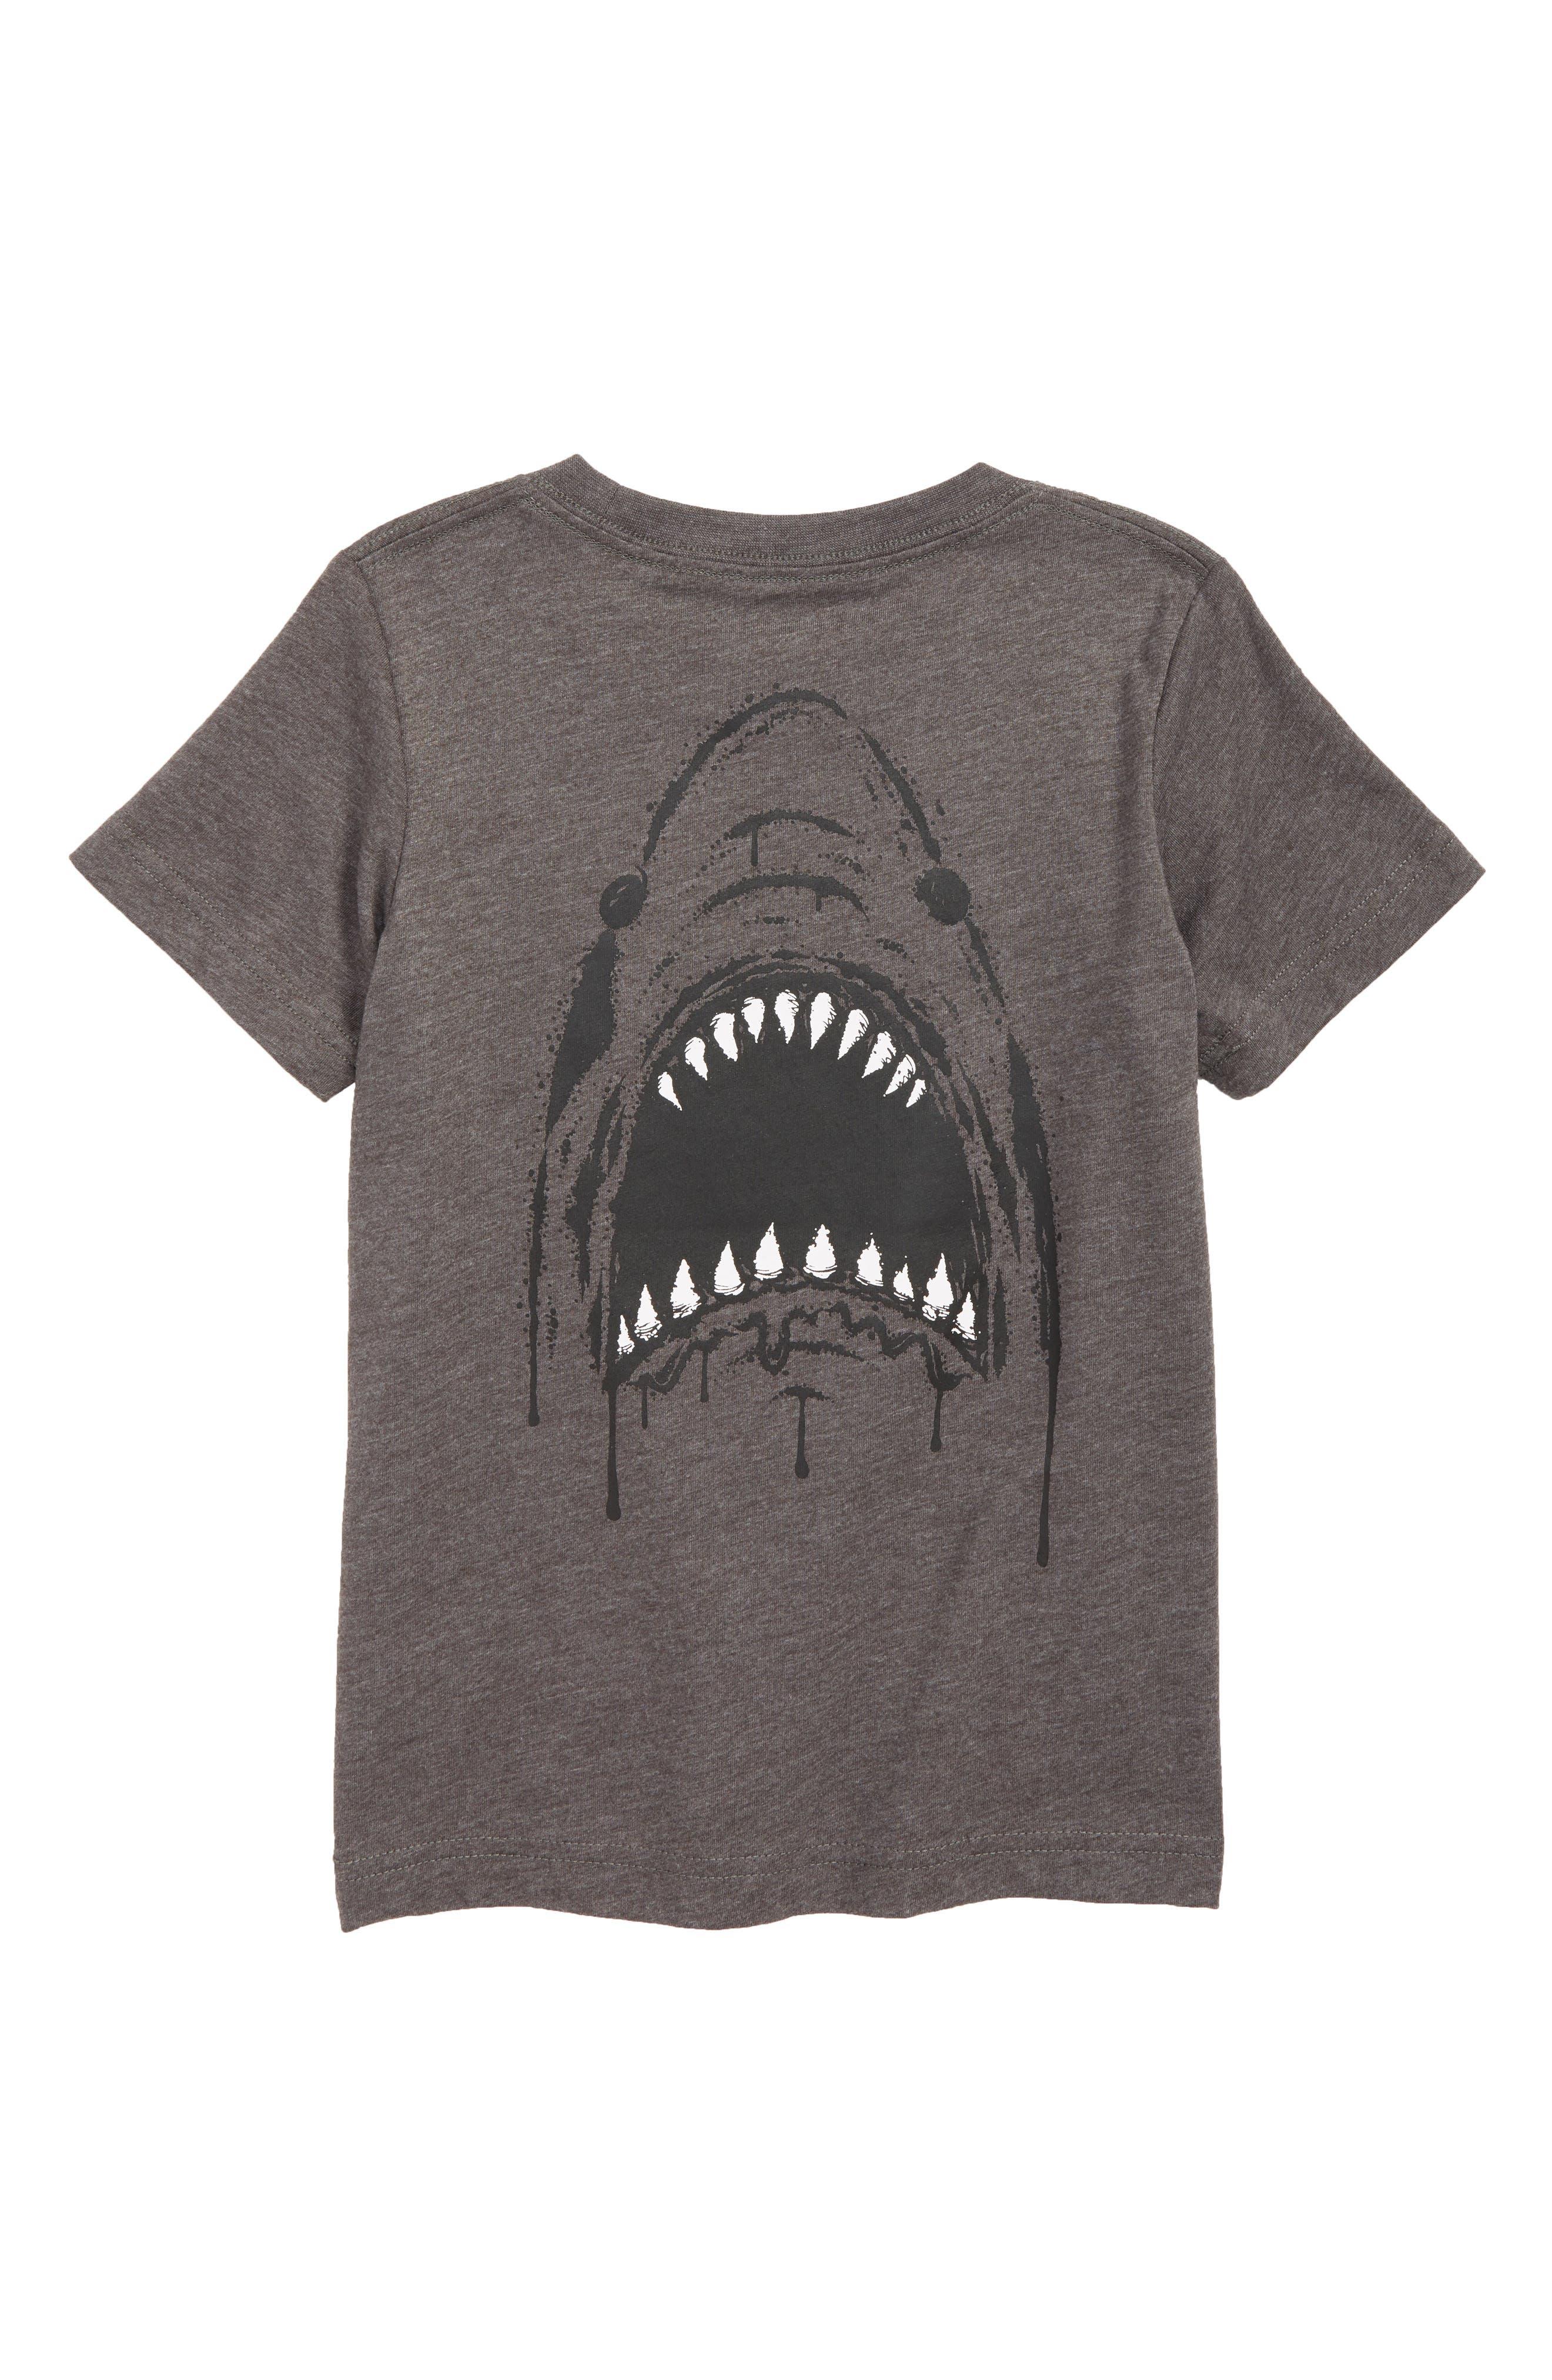 Shark T-Shirt,                             Alternate thumbnail 2, color,                             CHARCOAL HEATHER